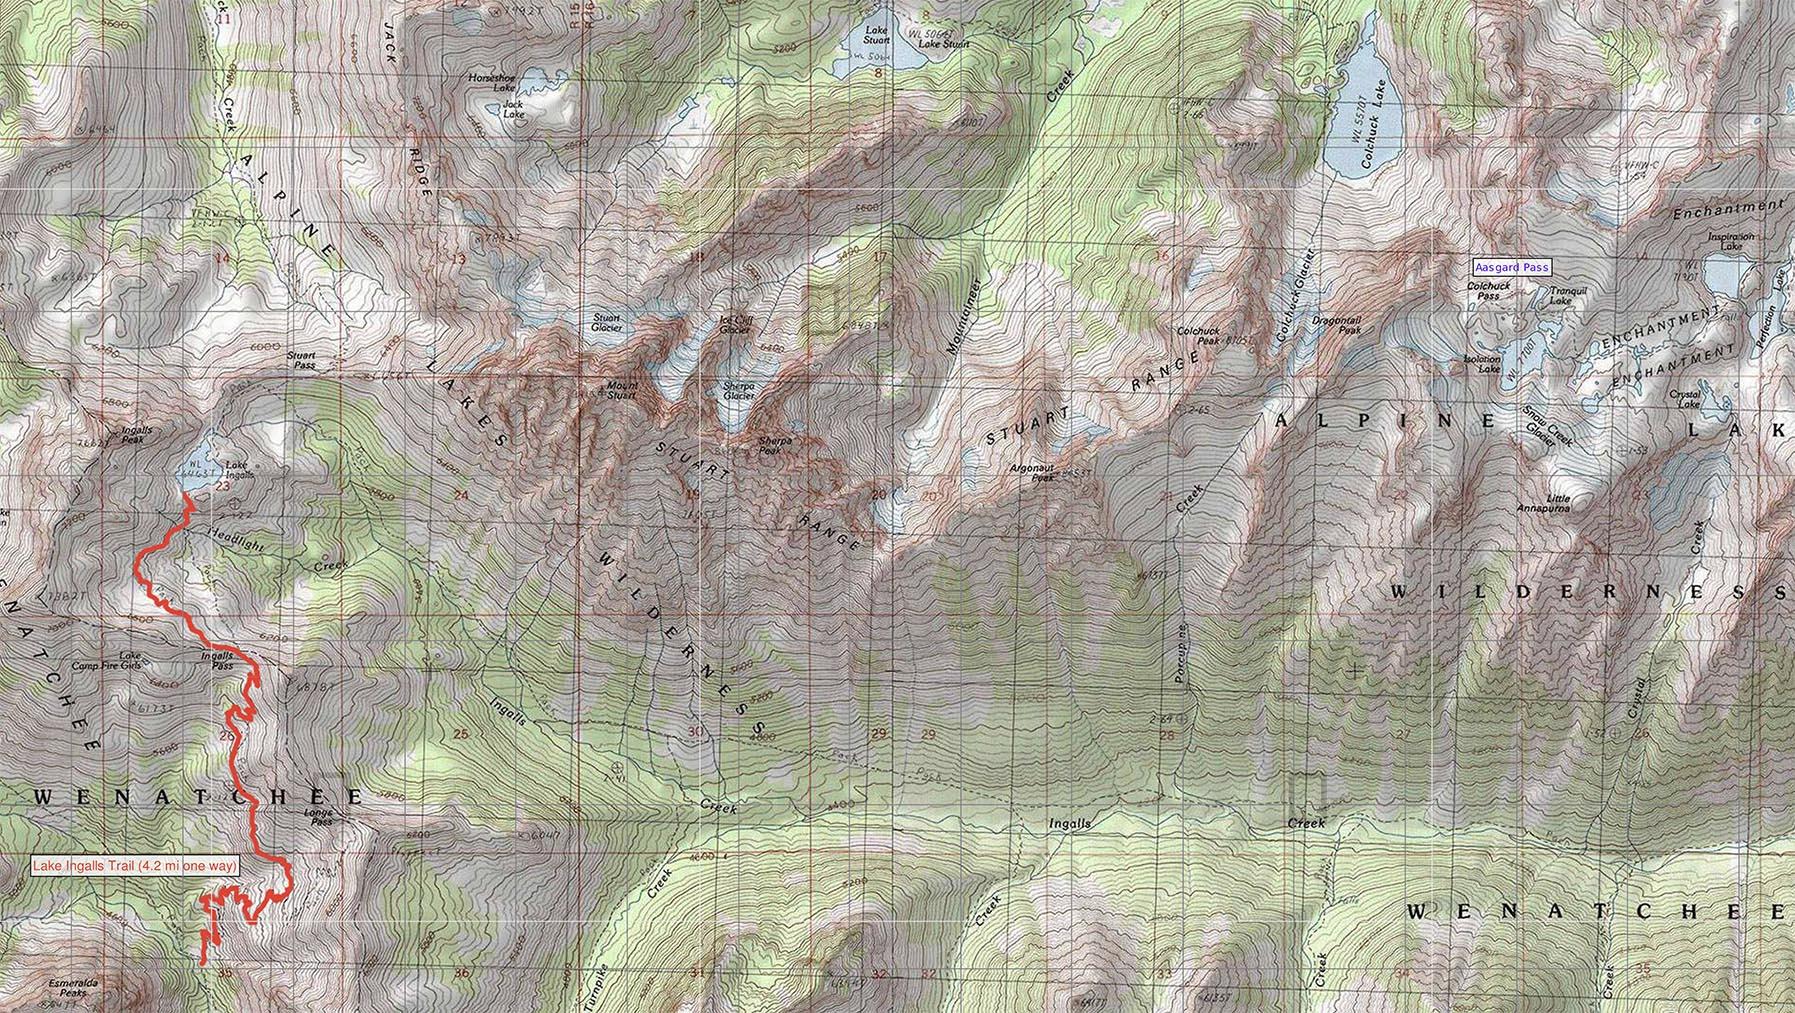 October 2015: Ingalls Lake | Turncarver | Tom Demshki